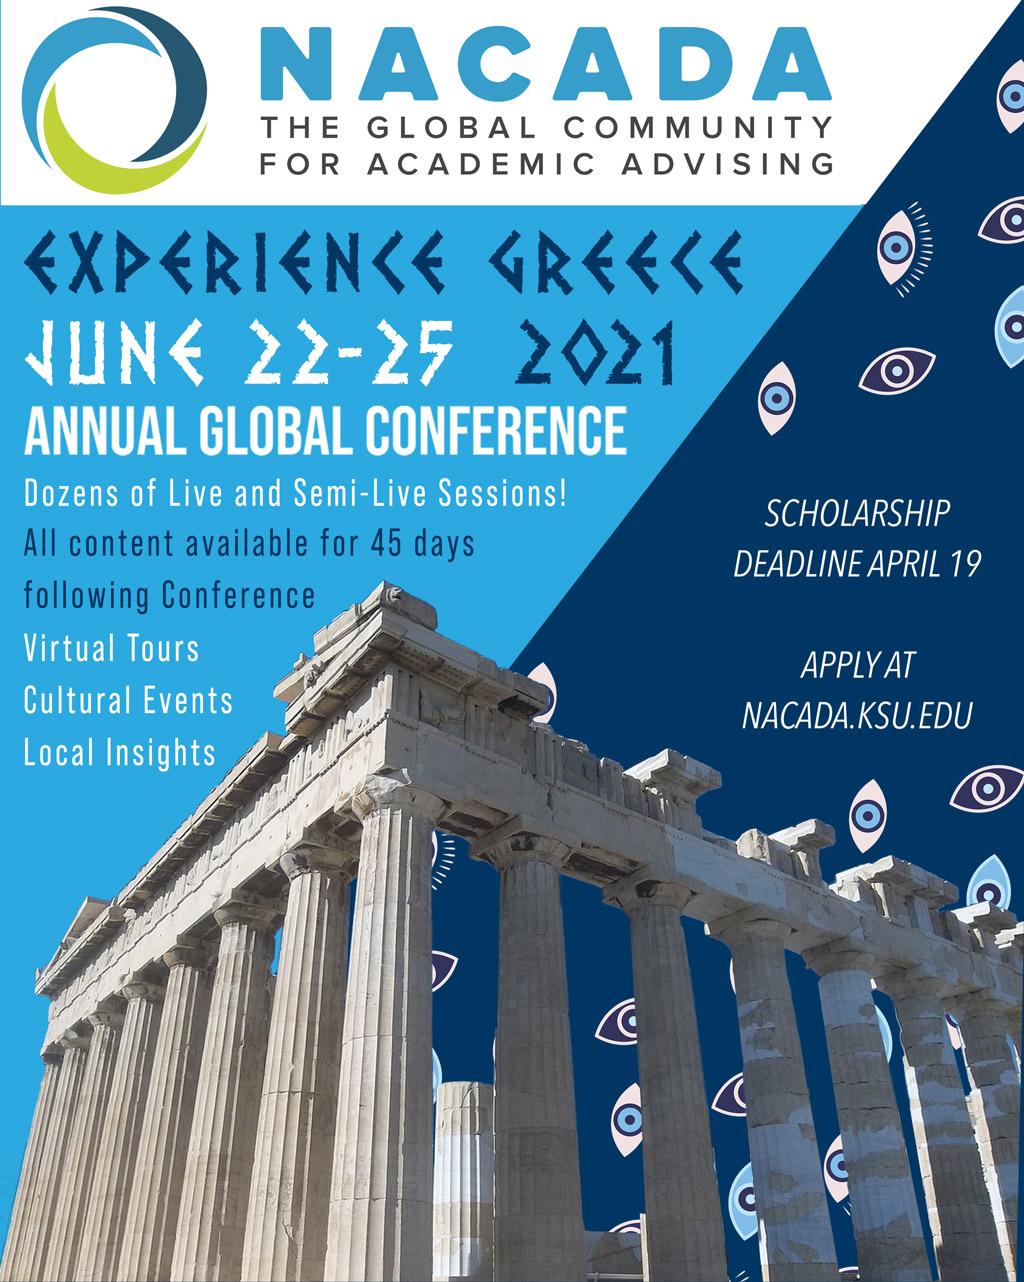 NACADA-International Conference poster